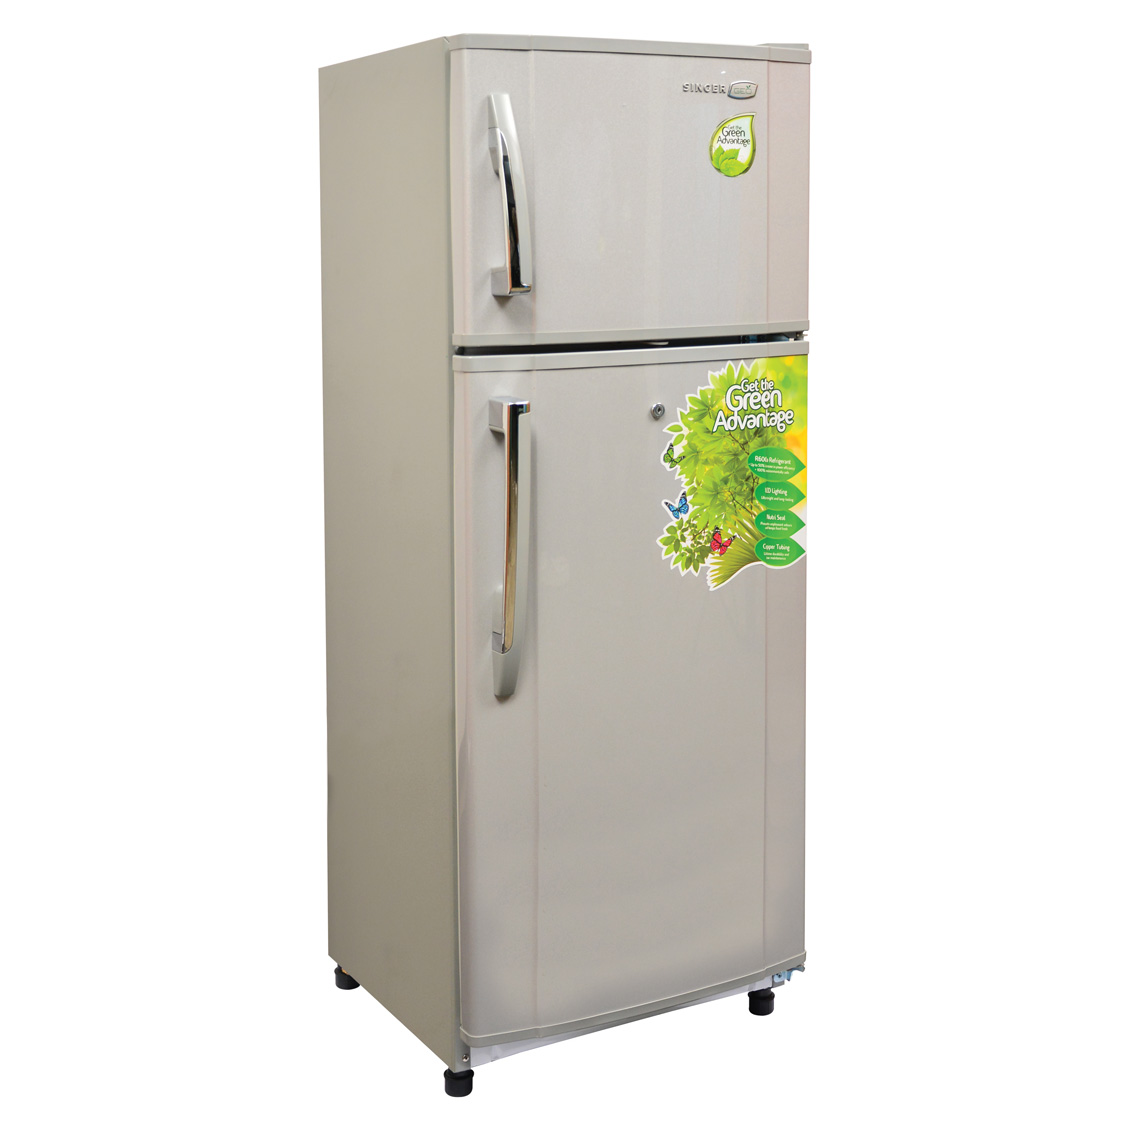 Singer geo refrigerator model geo 260nf refrigerators singer singer geo refrigerator model geo 260nf refrigerators singer singersl cheapraybanclubmaster Images